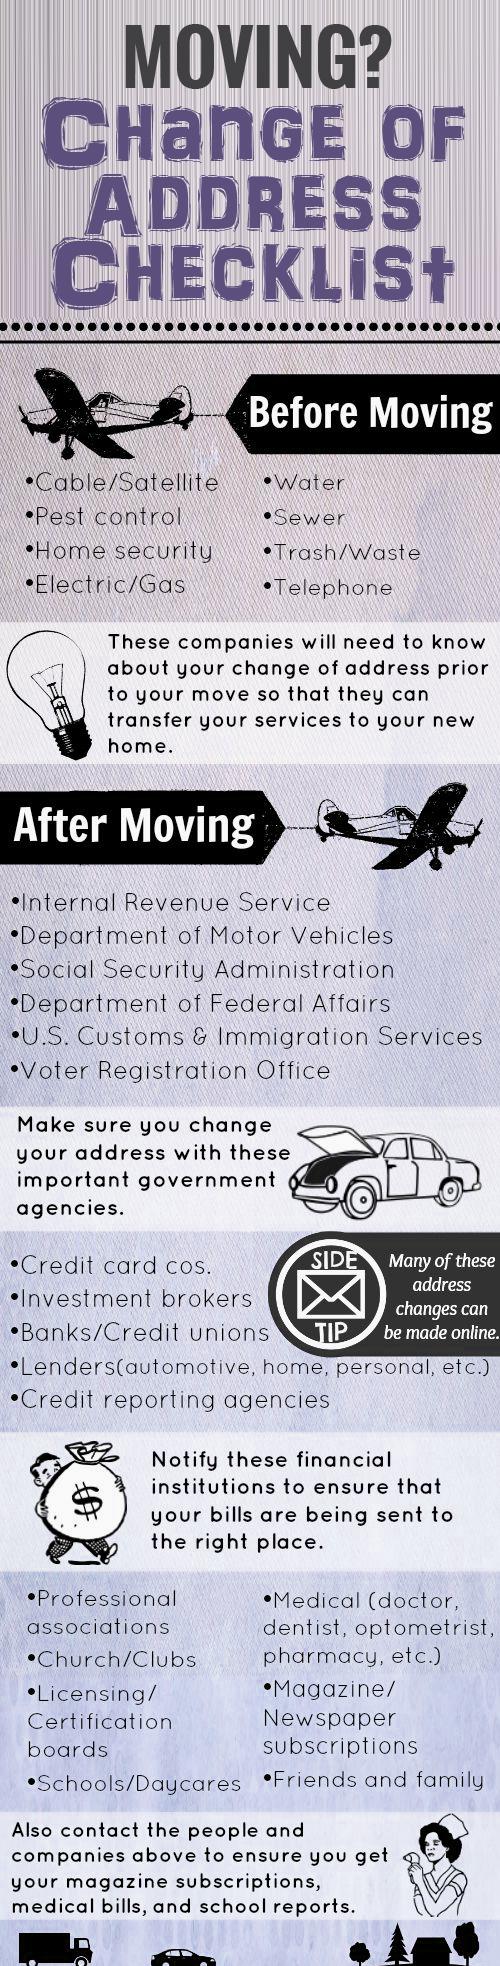 Moving-Change-of-Address-Checklist-infographic Moving? Change of Address Checklist Orlando   Central Florida